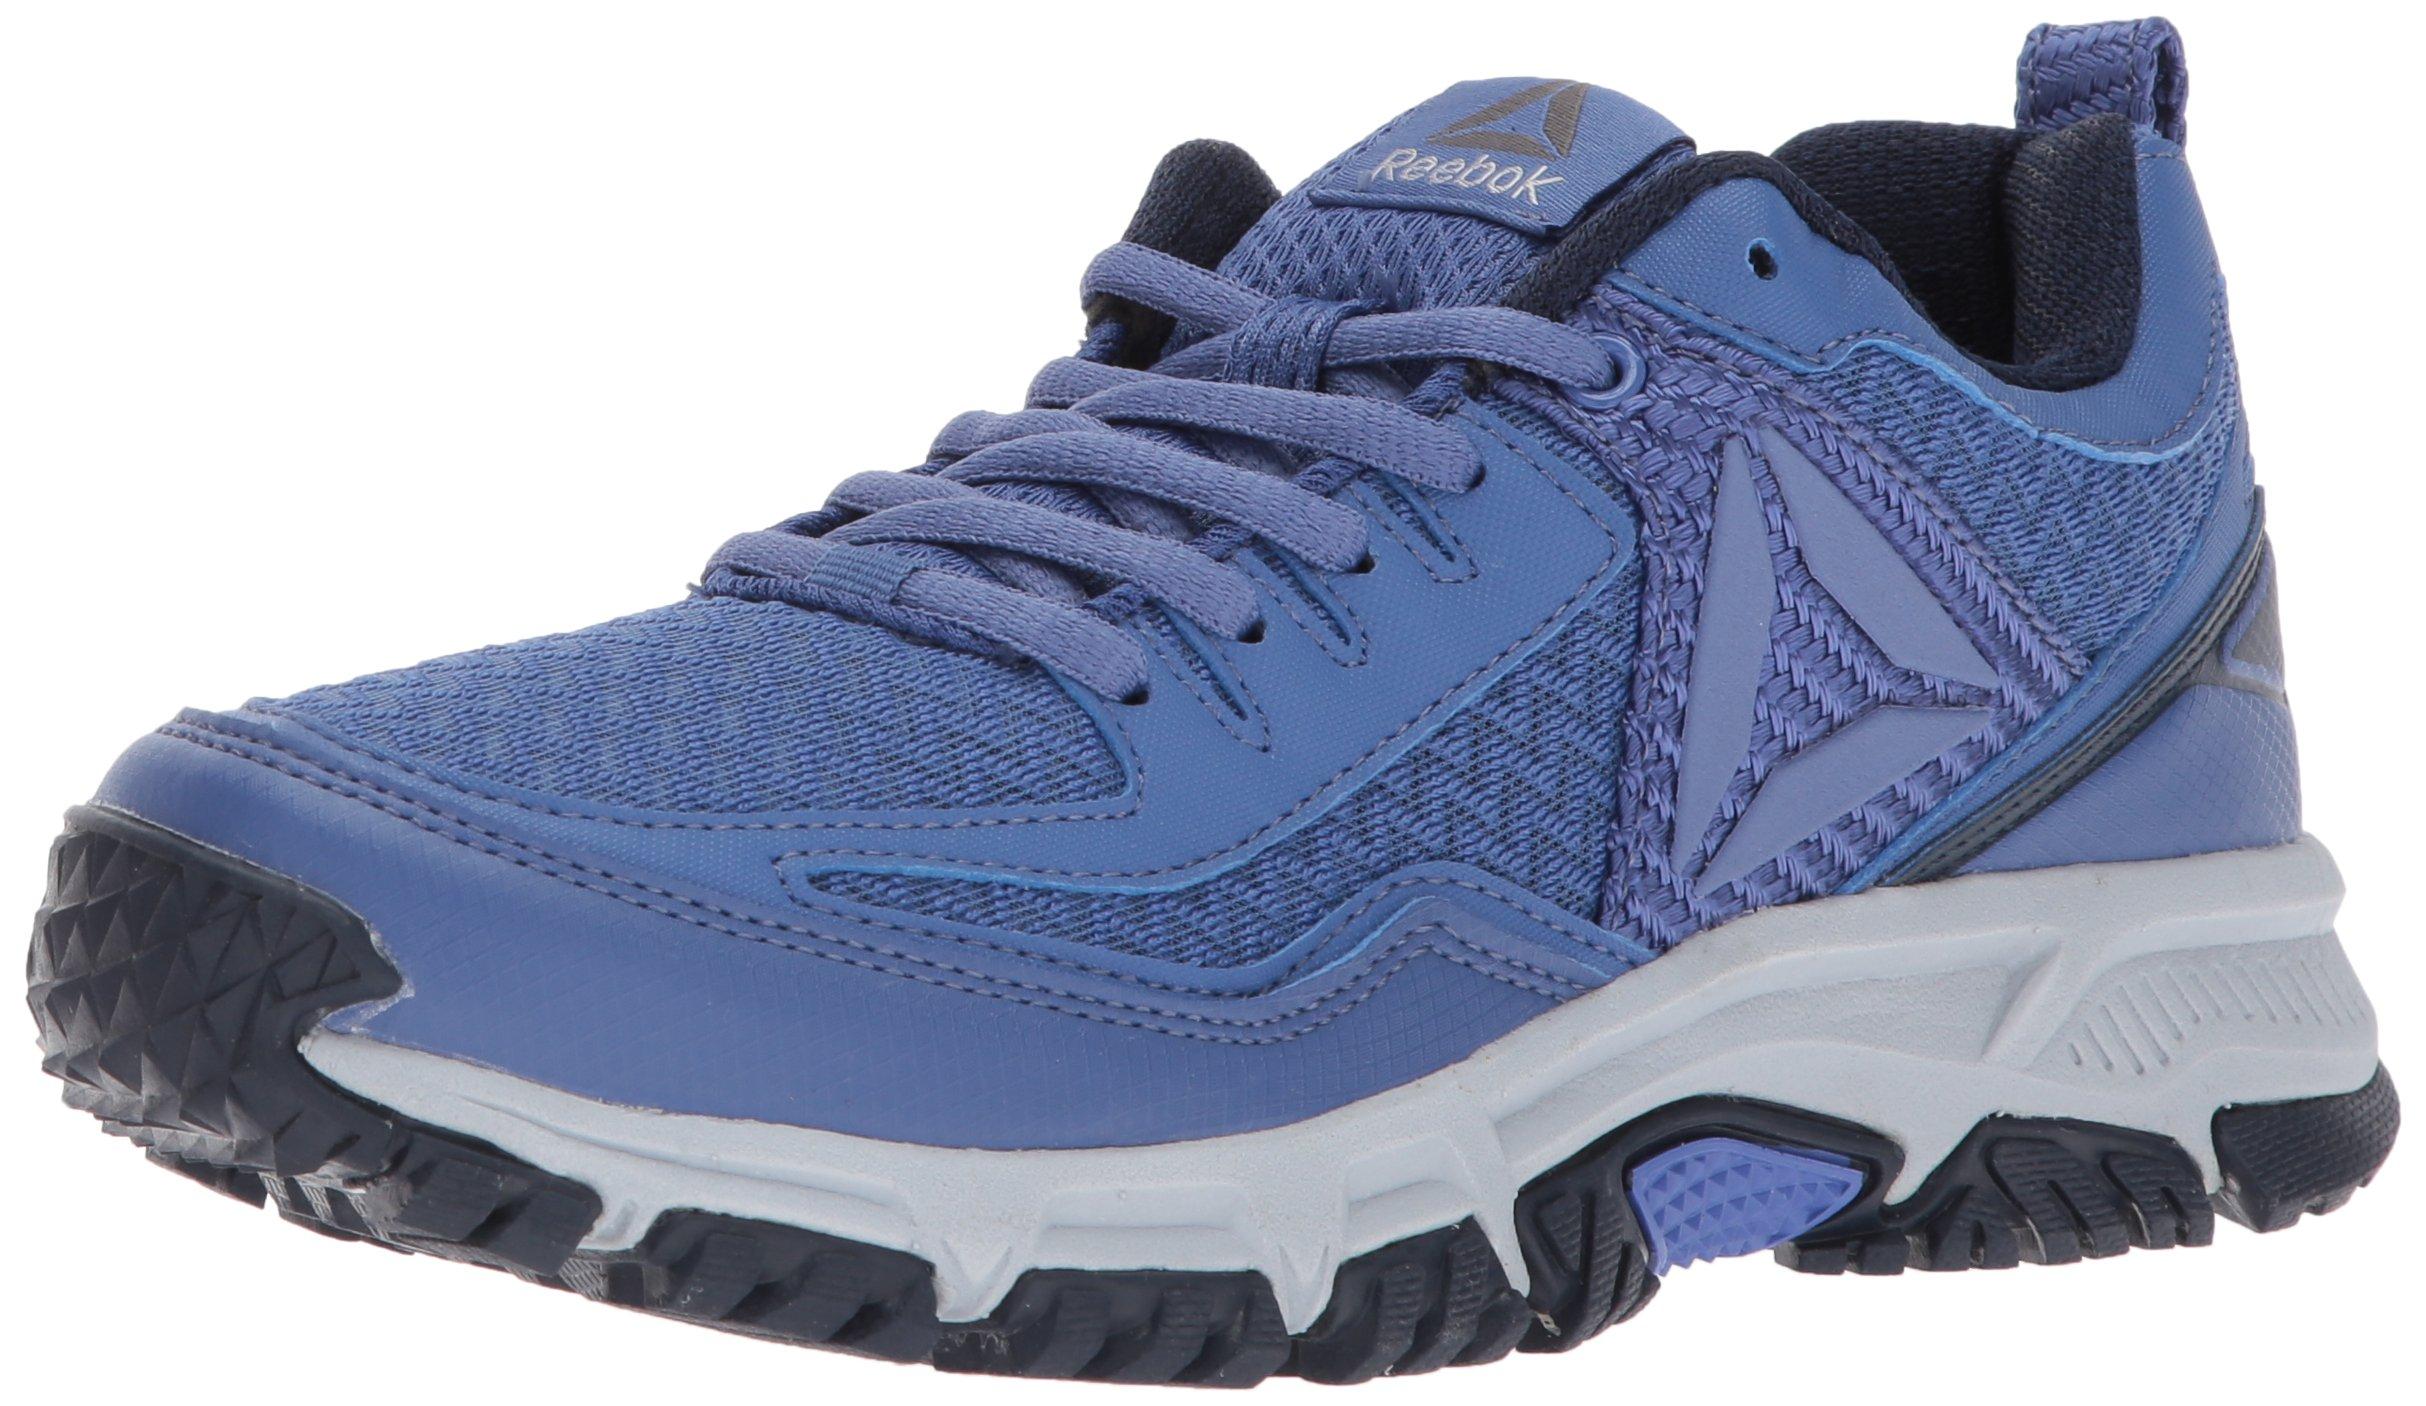 Reebok Women's Ridgerider Trail 2.0 Track Shoe, Lilac Shadow/Coll. Navy/Cloud Grey/Silver/Pewter/Black, 6 M US